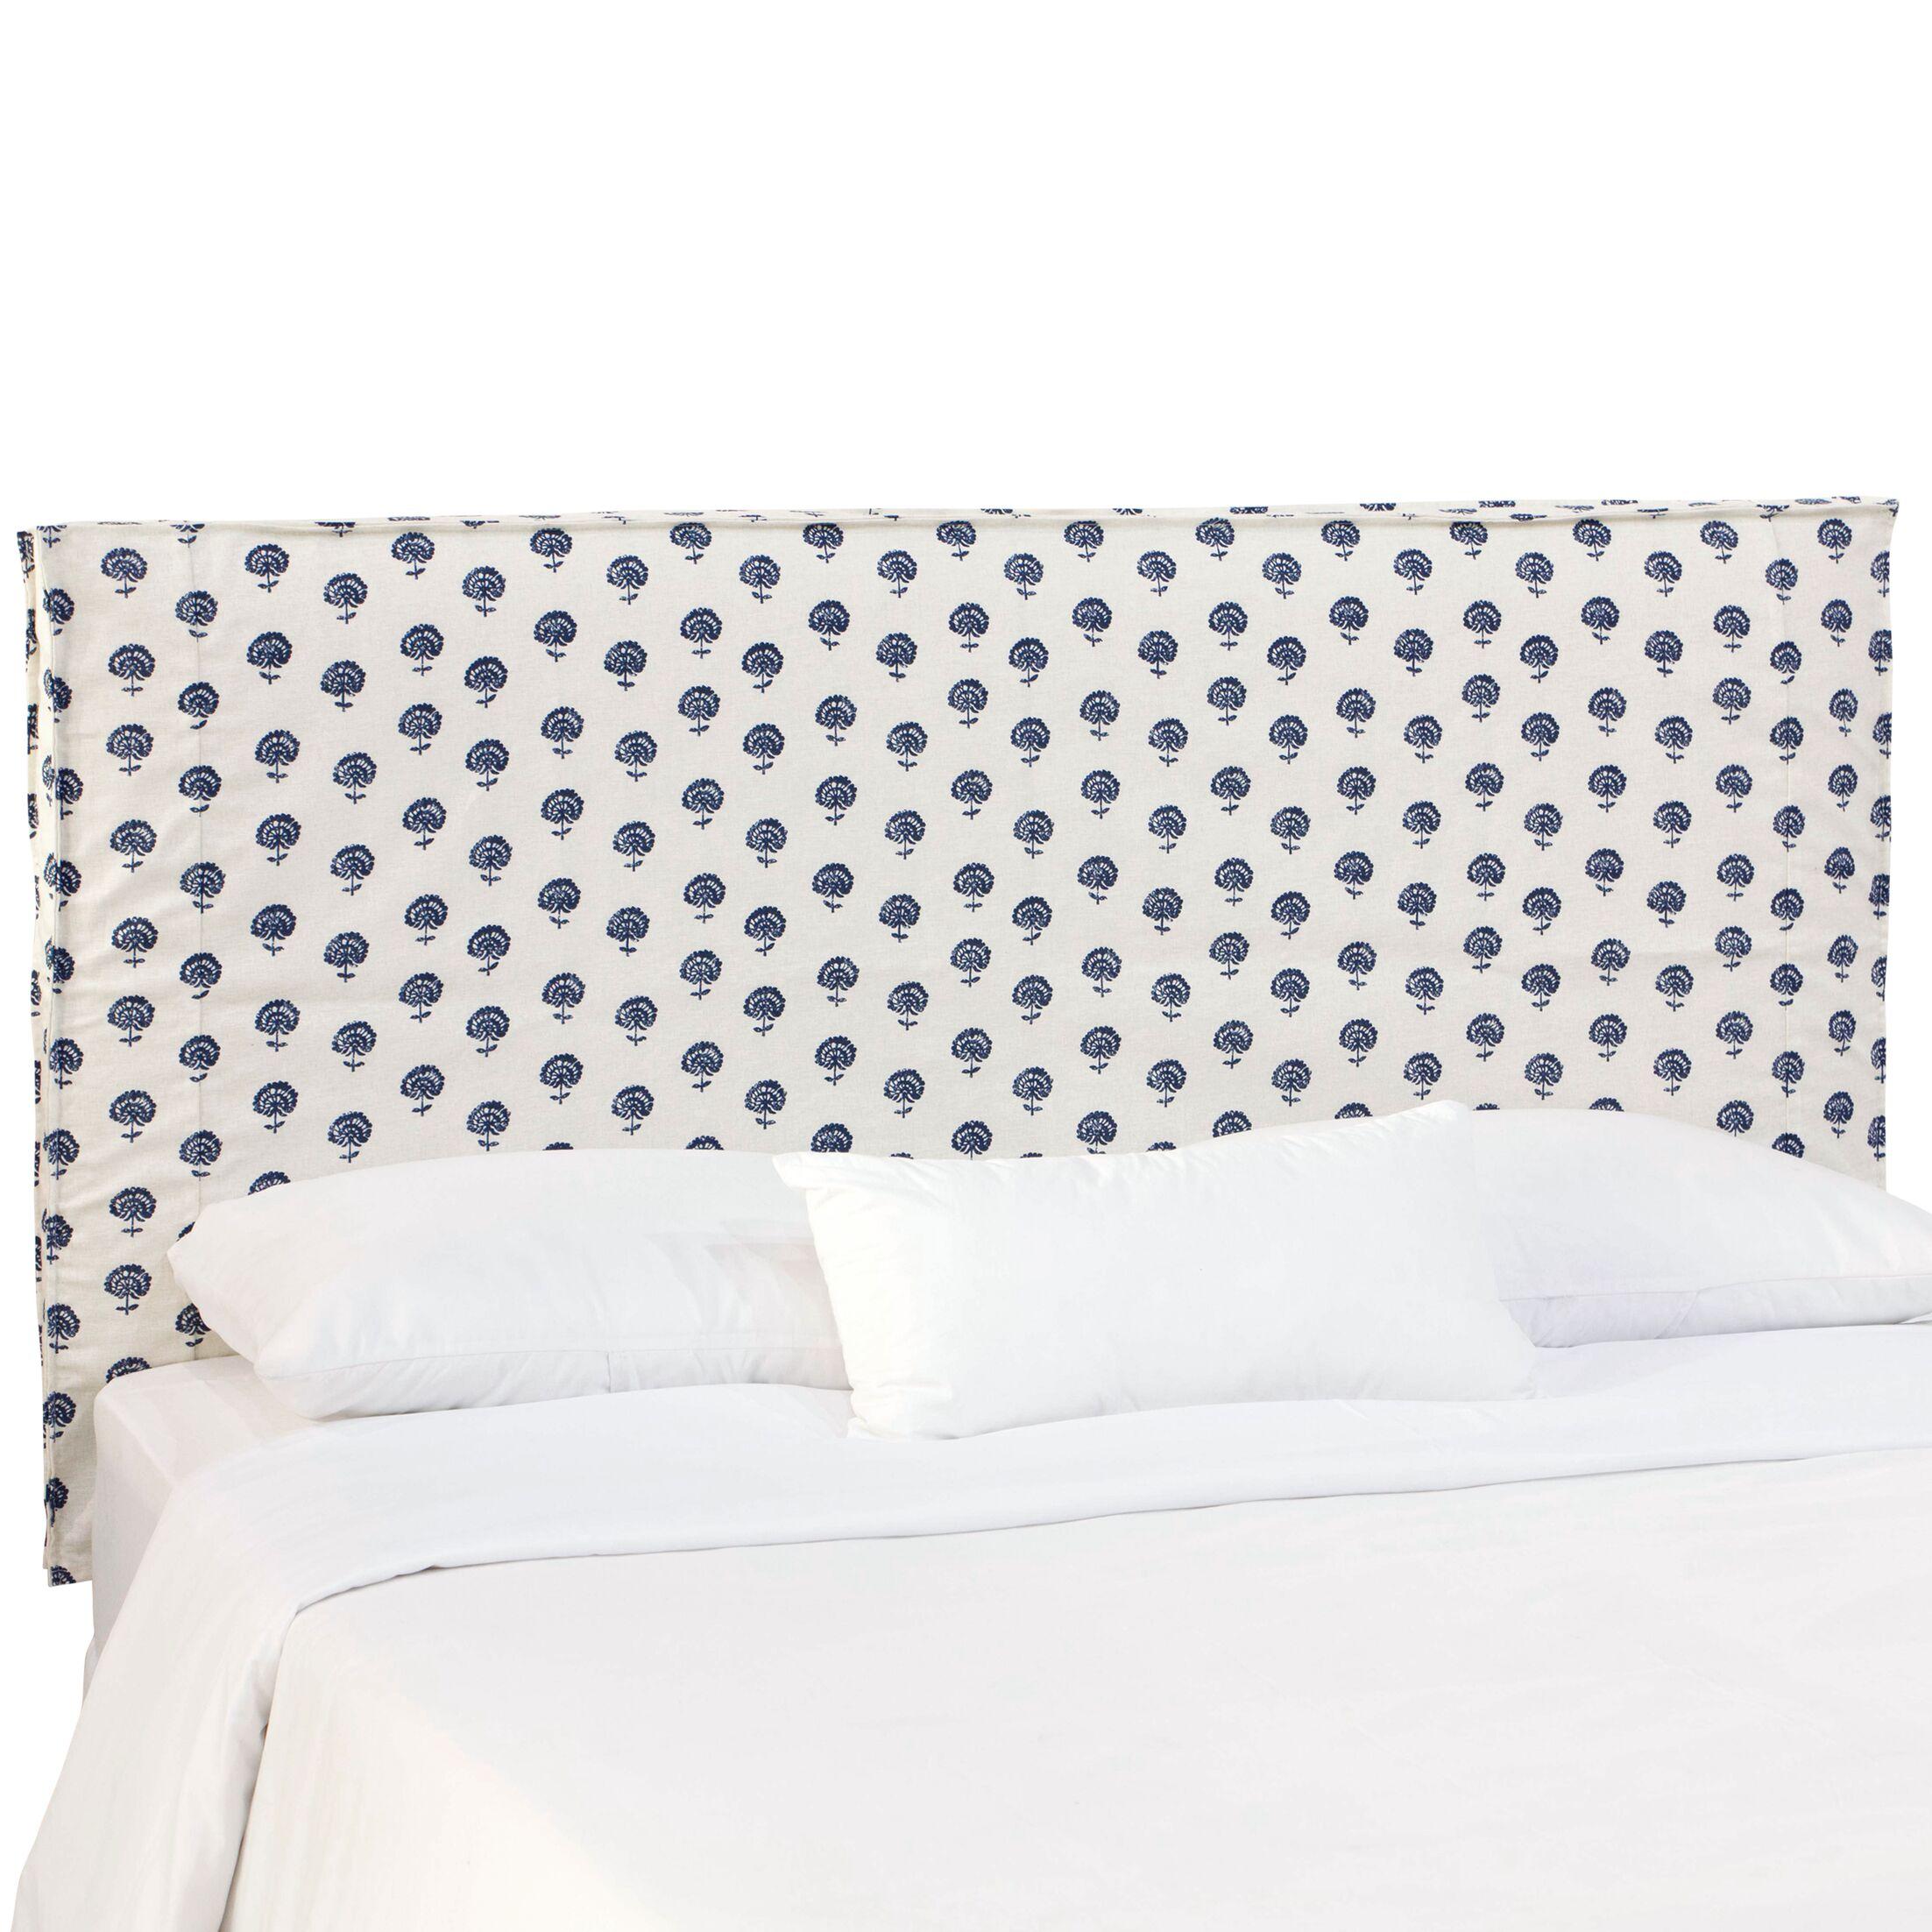 Sylvaner Upholstered Panel Headboard Size: Queen, Upholstery: Hand Flora Indigo